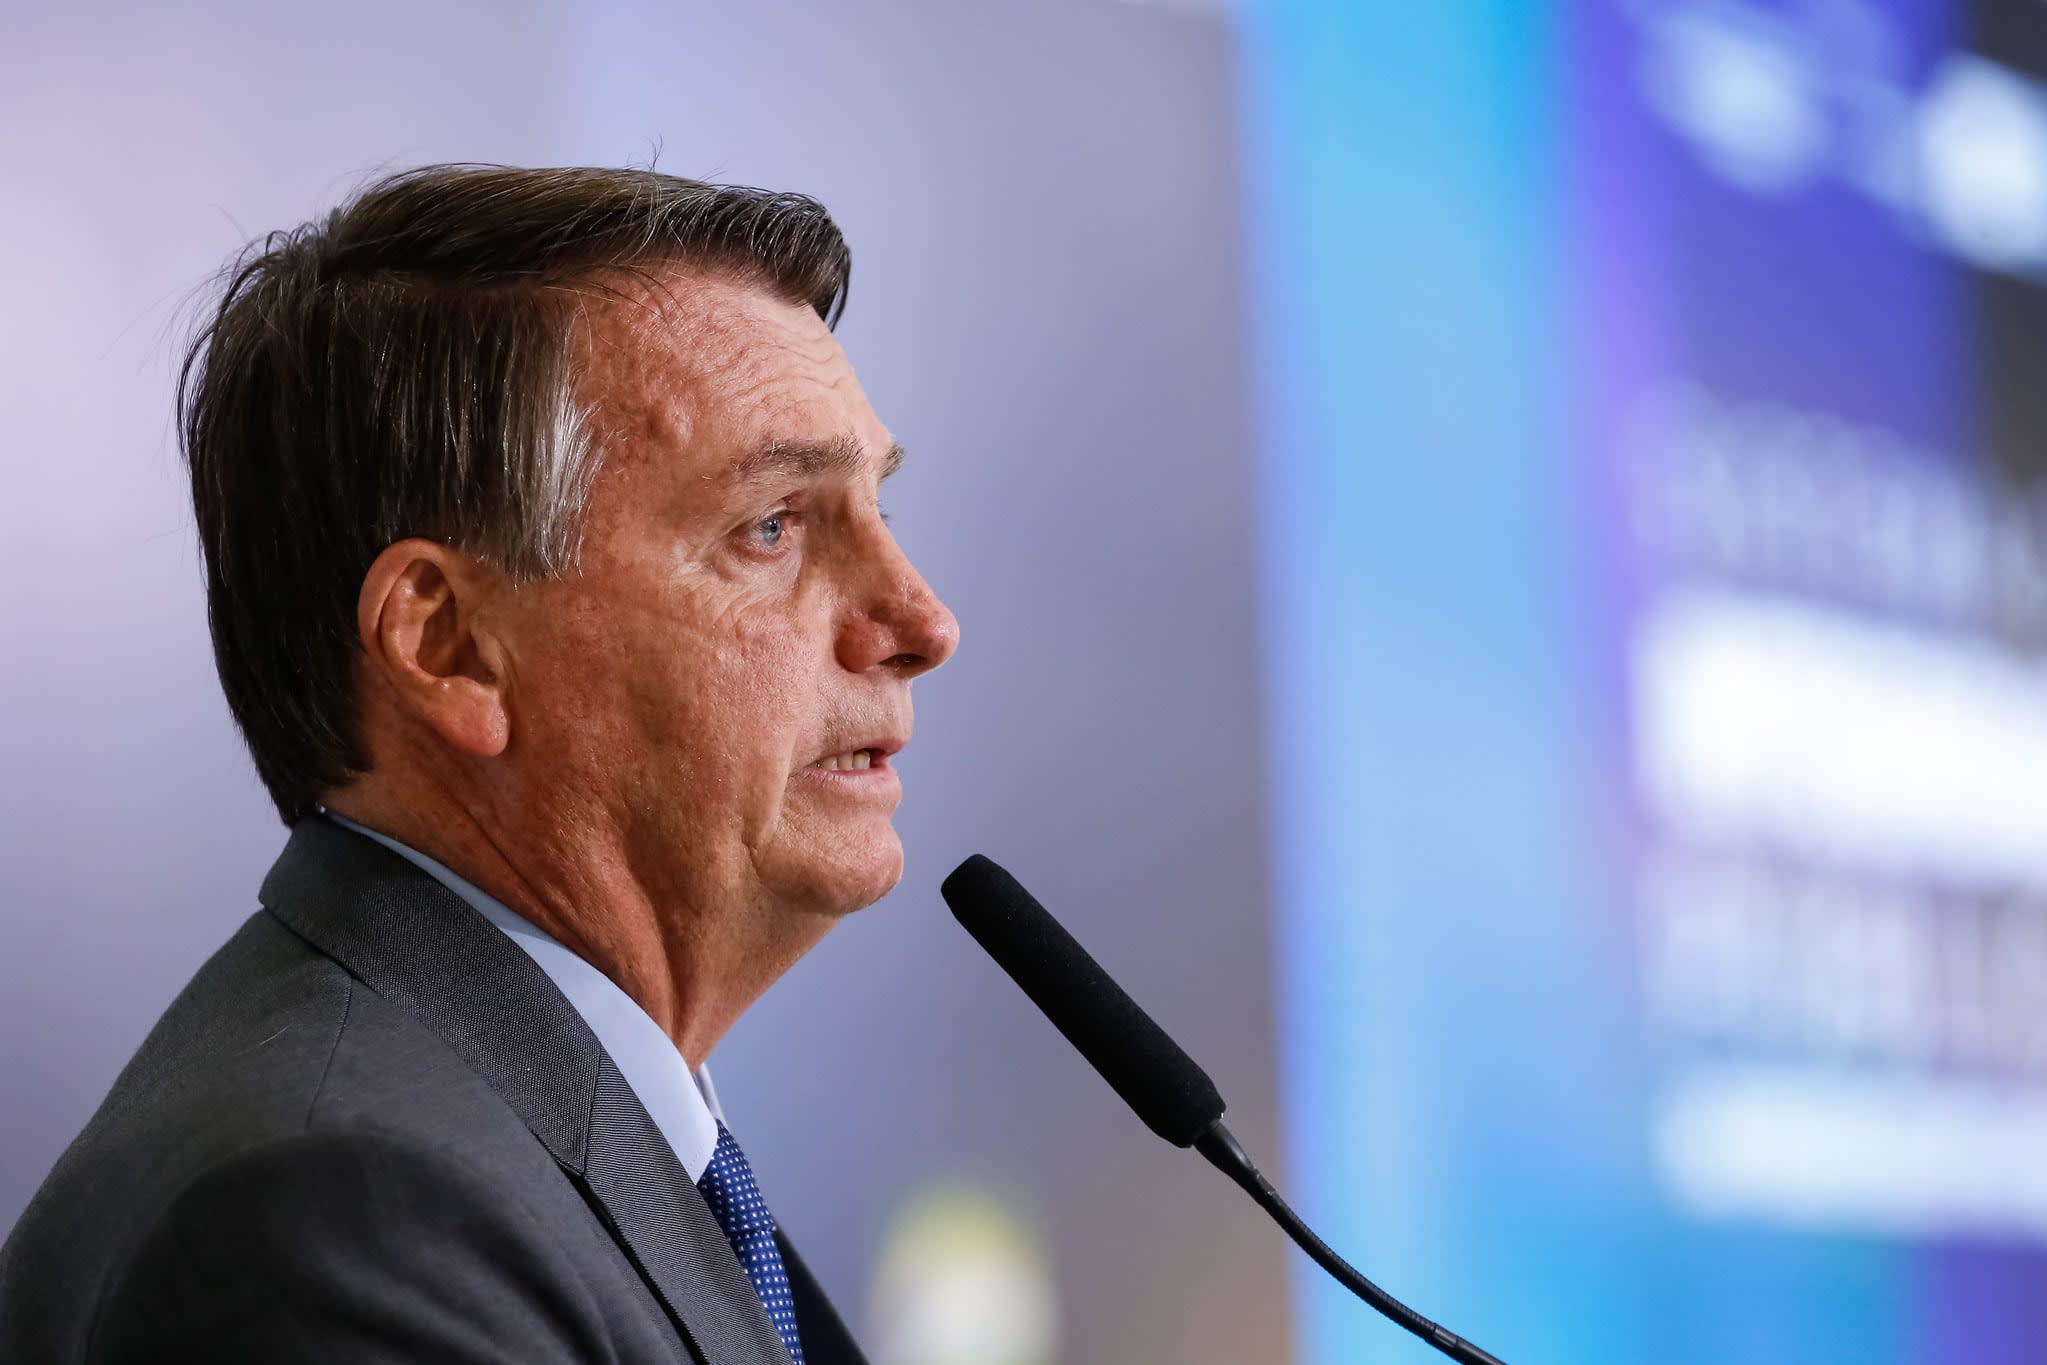 Bolsonaro falando no microfone.